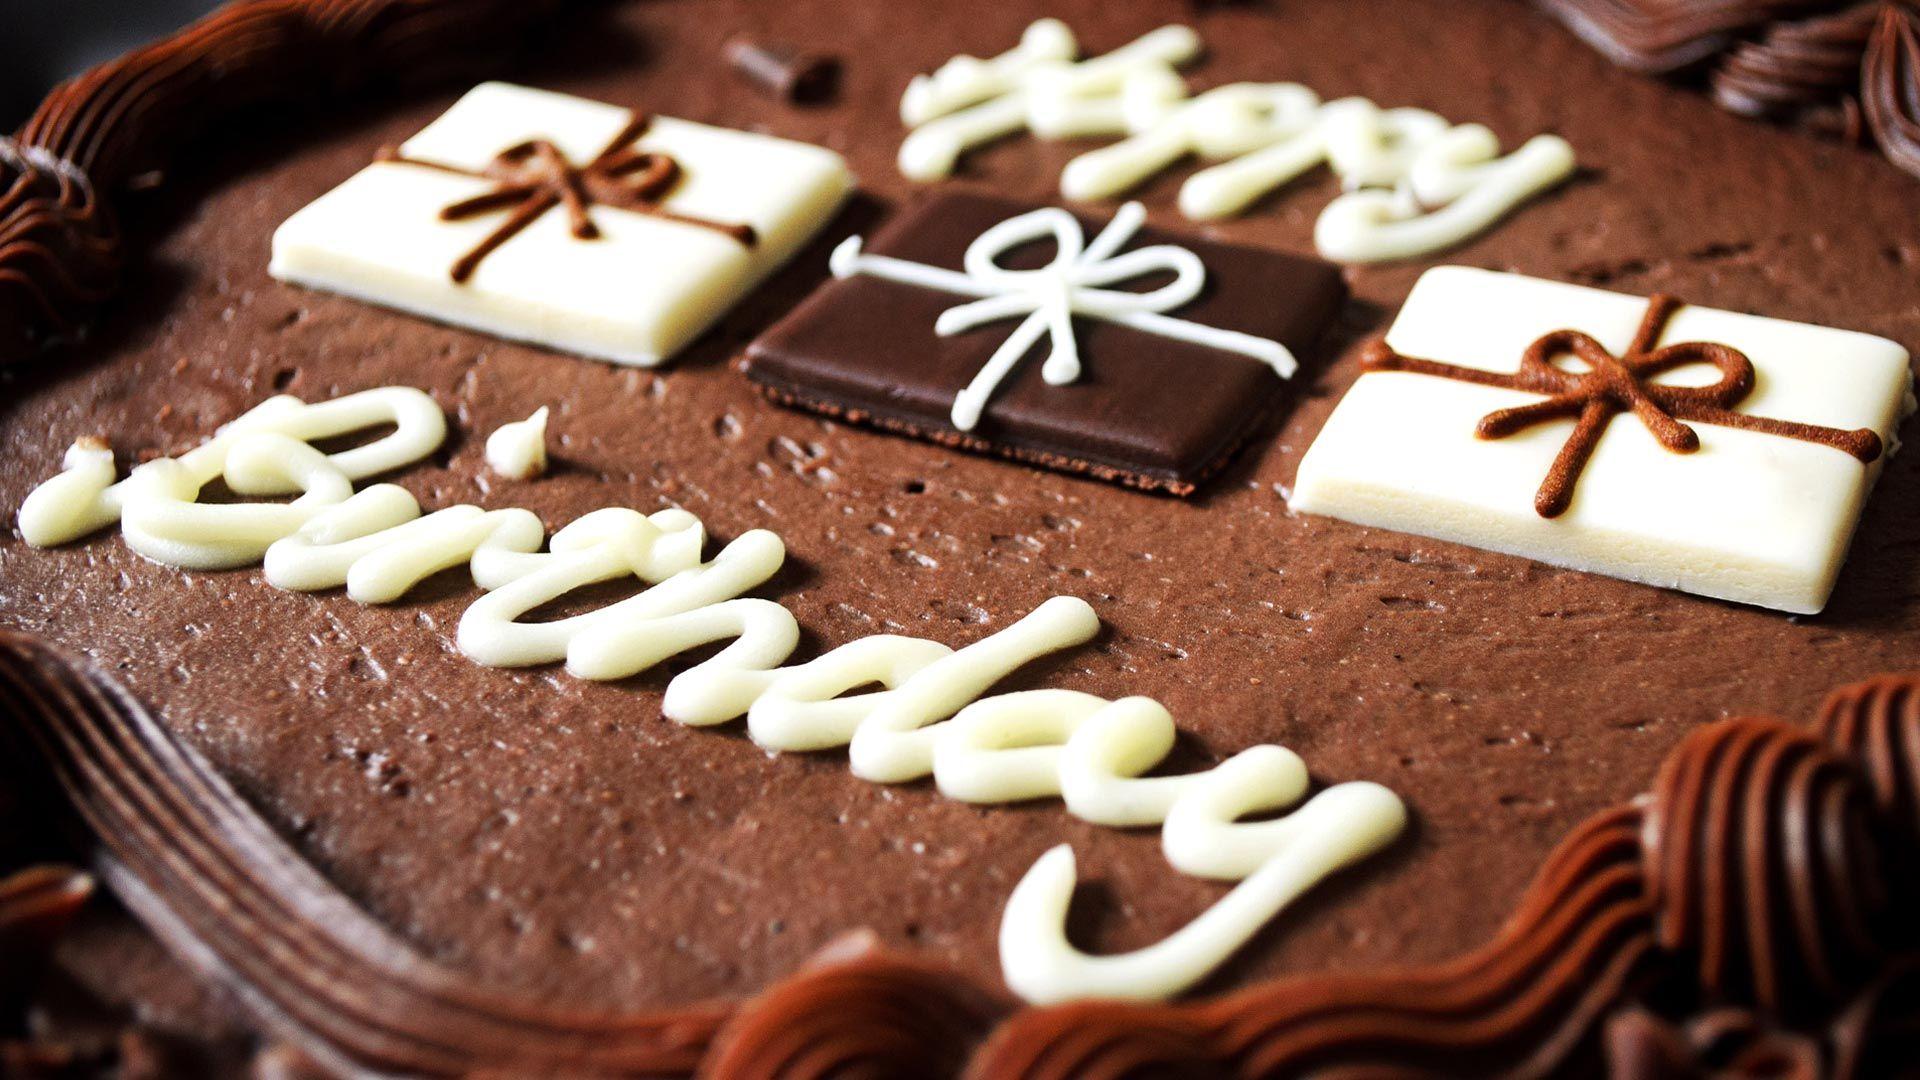 Happy Birthday Cake Slice Beautiful Wallpaper Hd Wallpapers Rocks